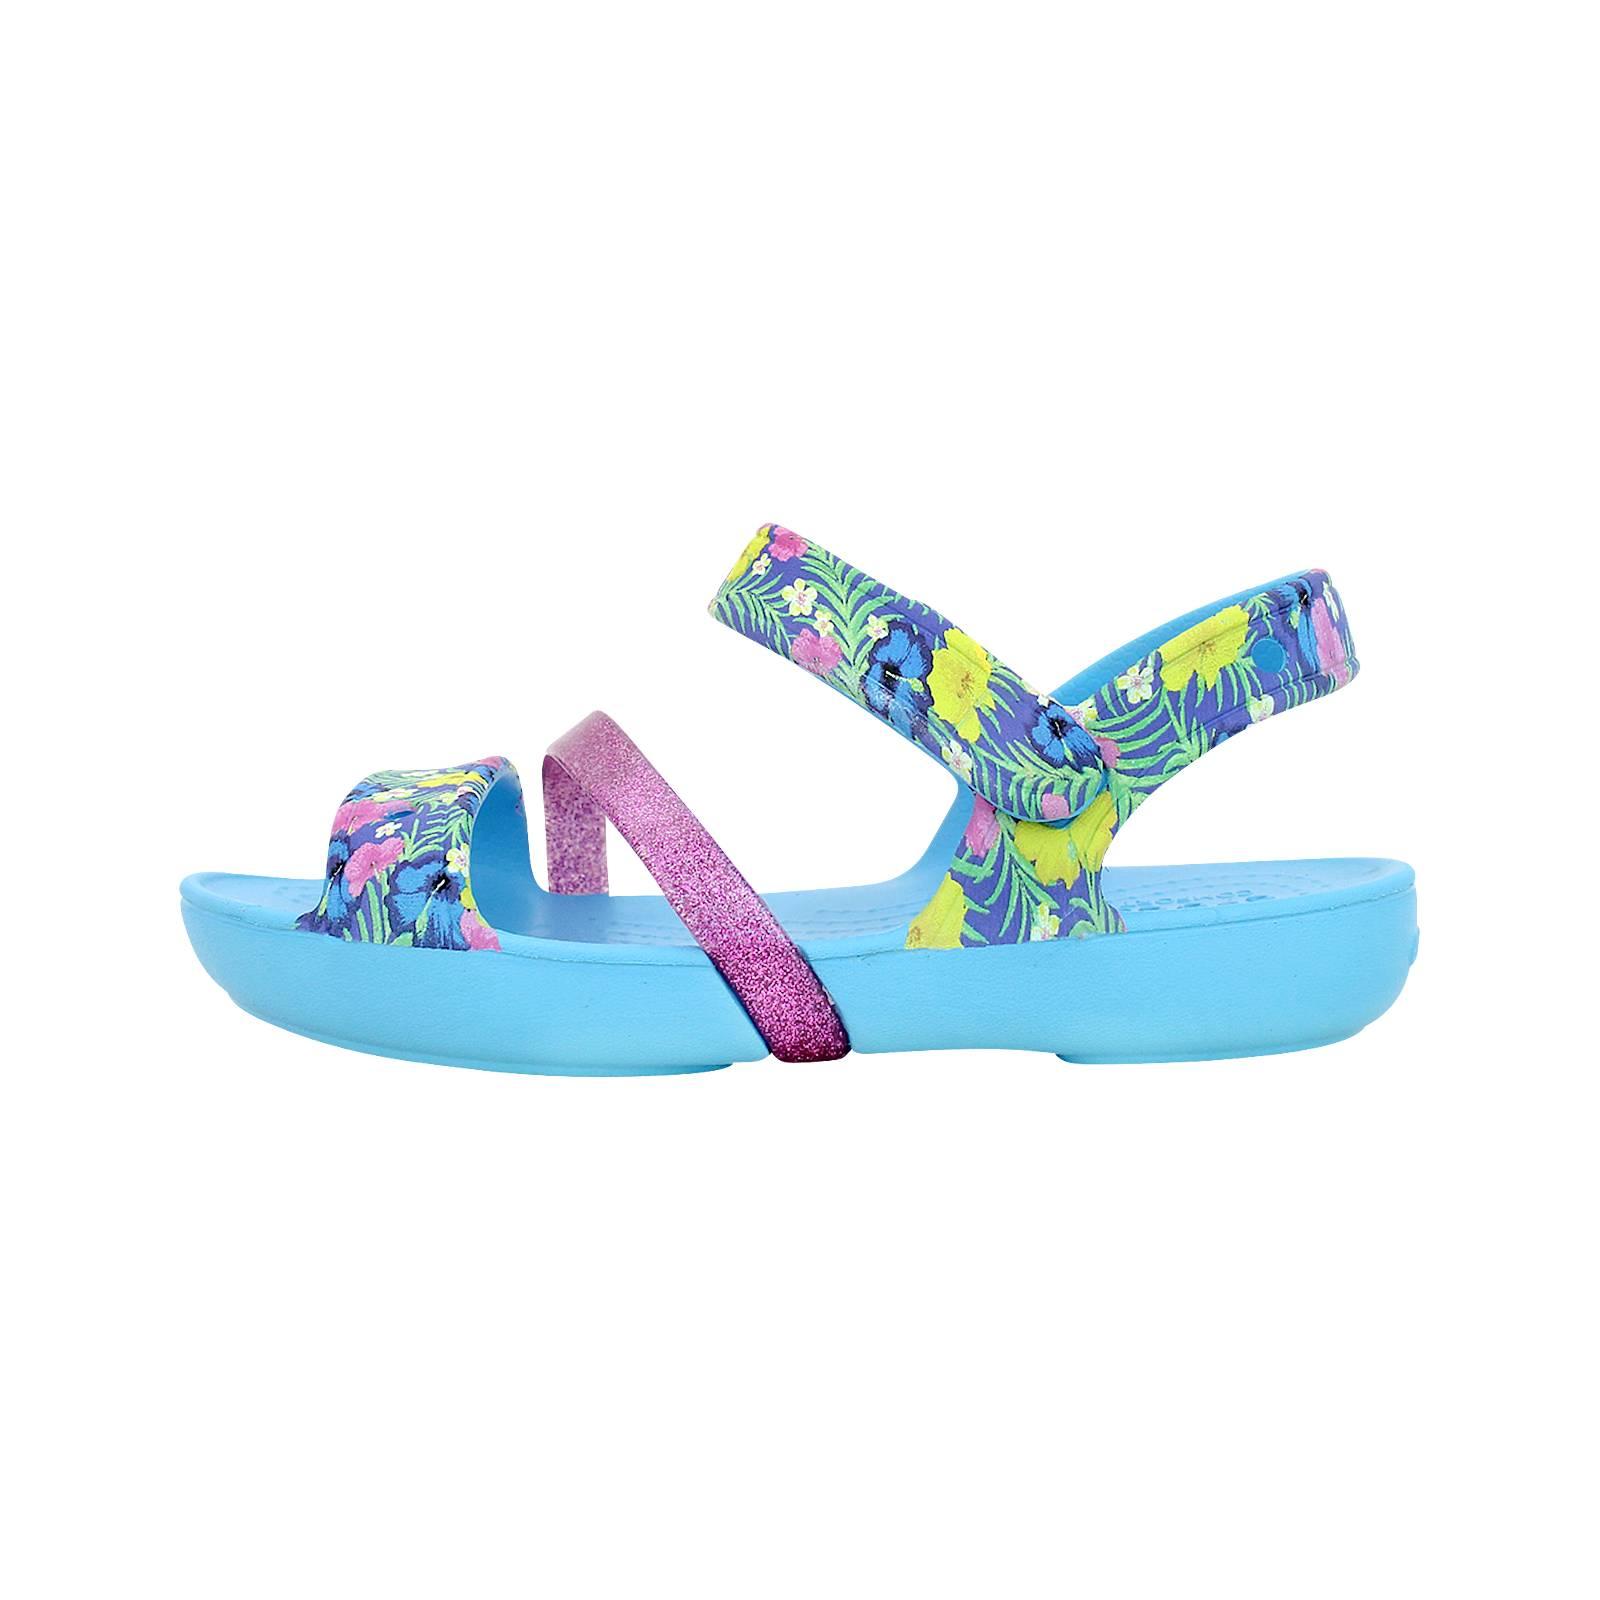 0439c00dfd5b Crocs Lina Sandal S - Crocs Kids  sandals made of croslite - Gianna ...